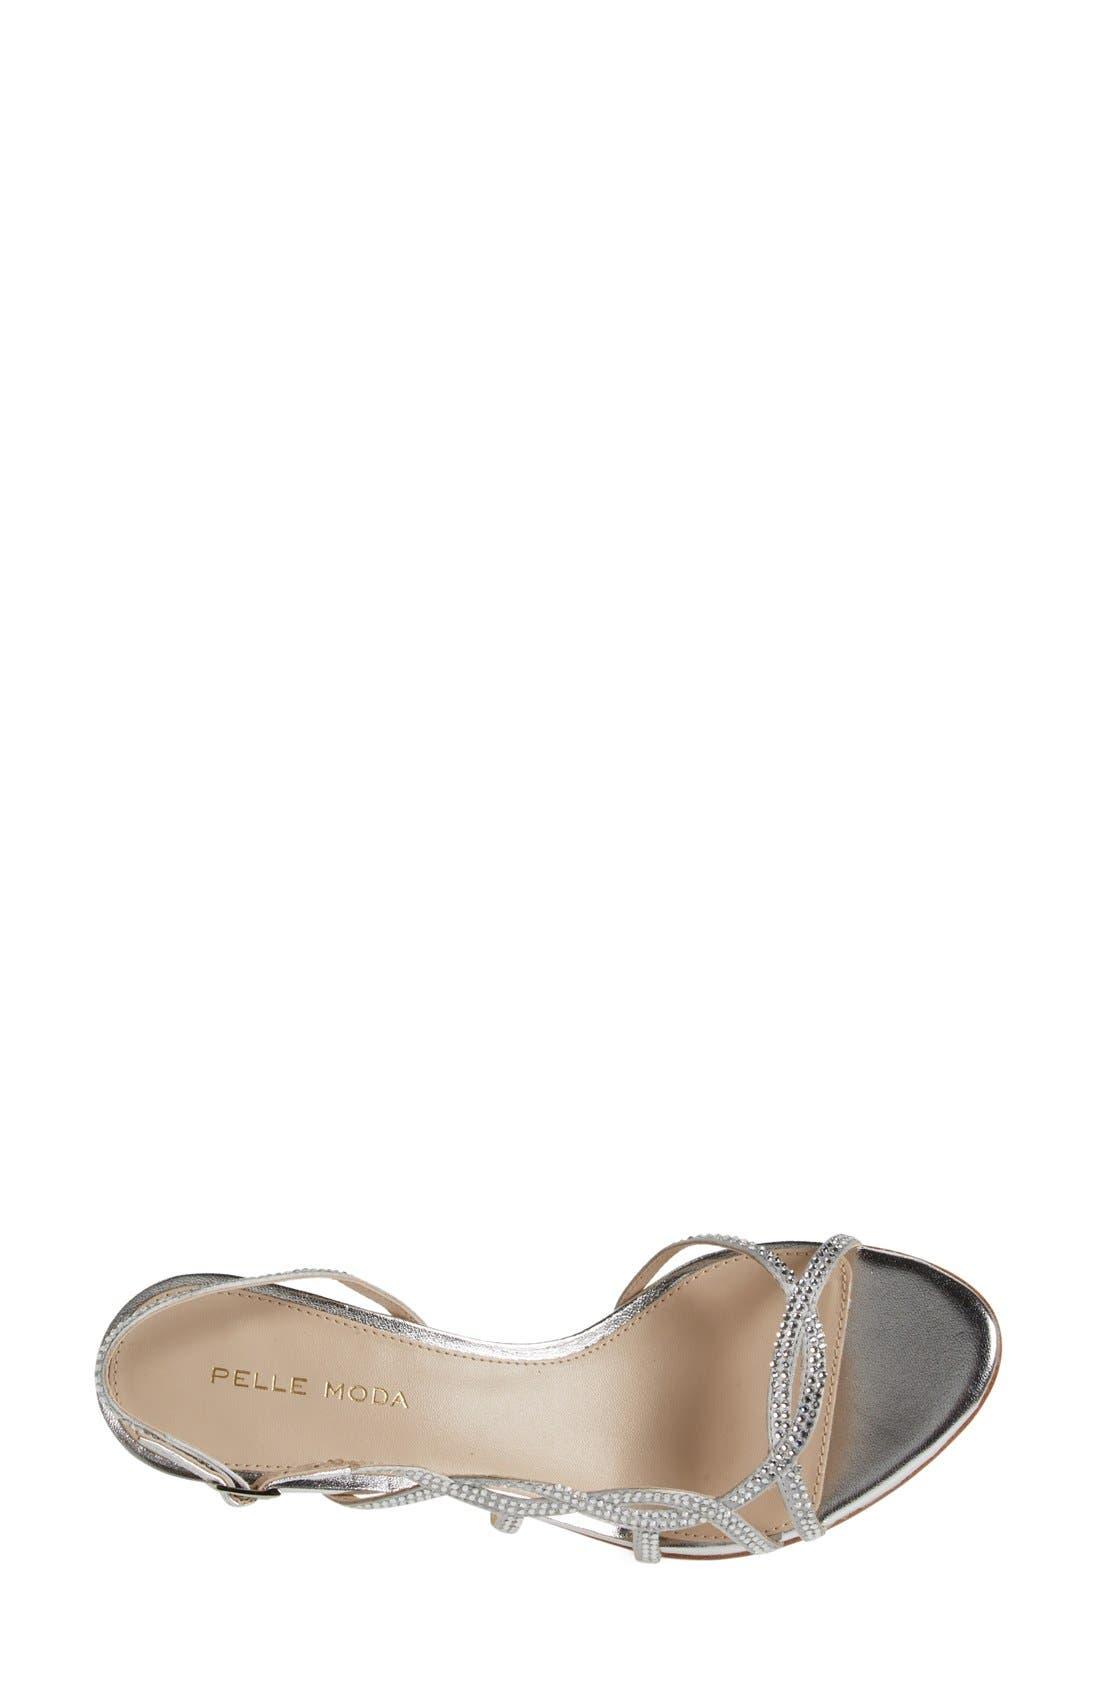 Alternate Image 3  - Pelle Moda 'Amina' Metallic Slingback Sandal (Women)